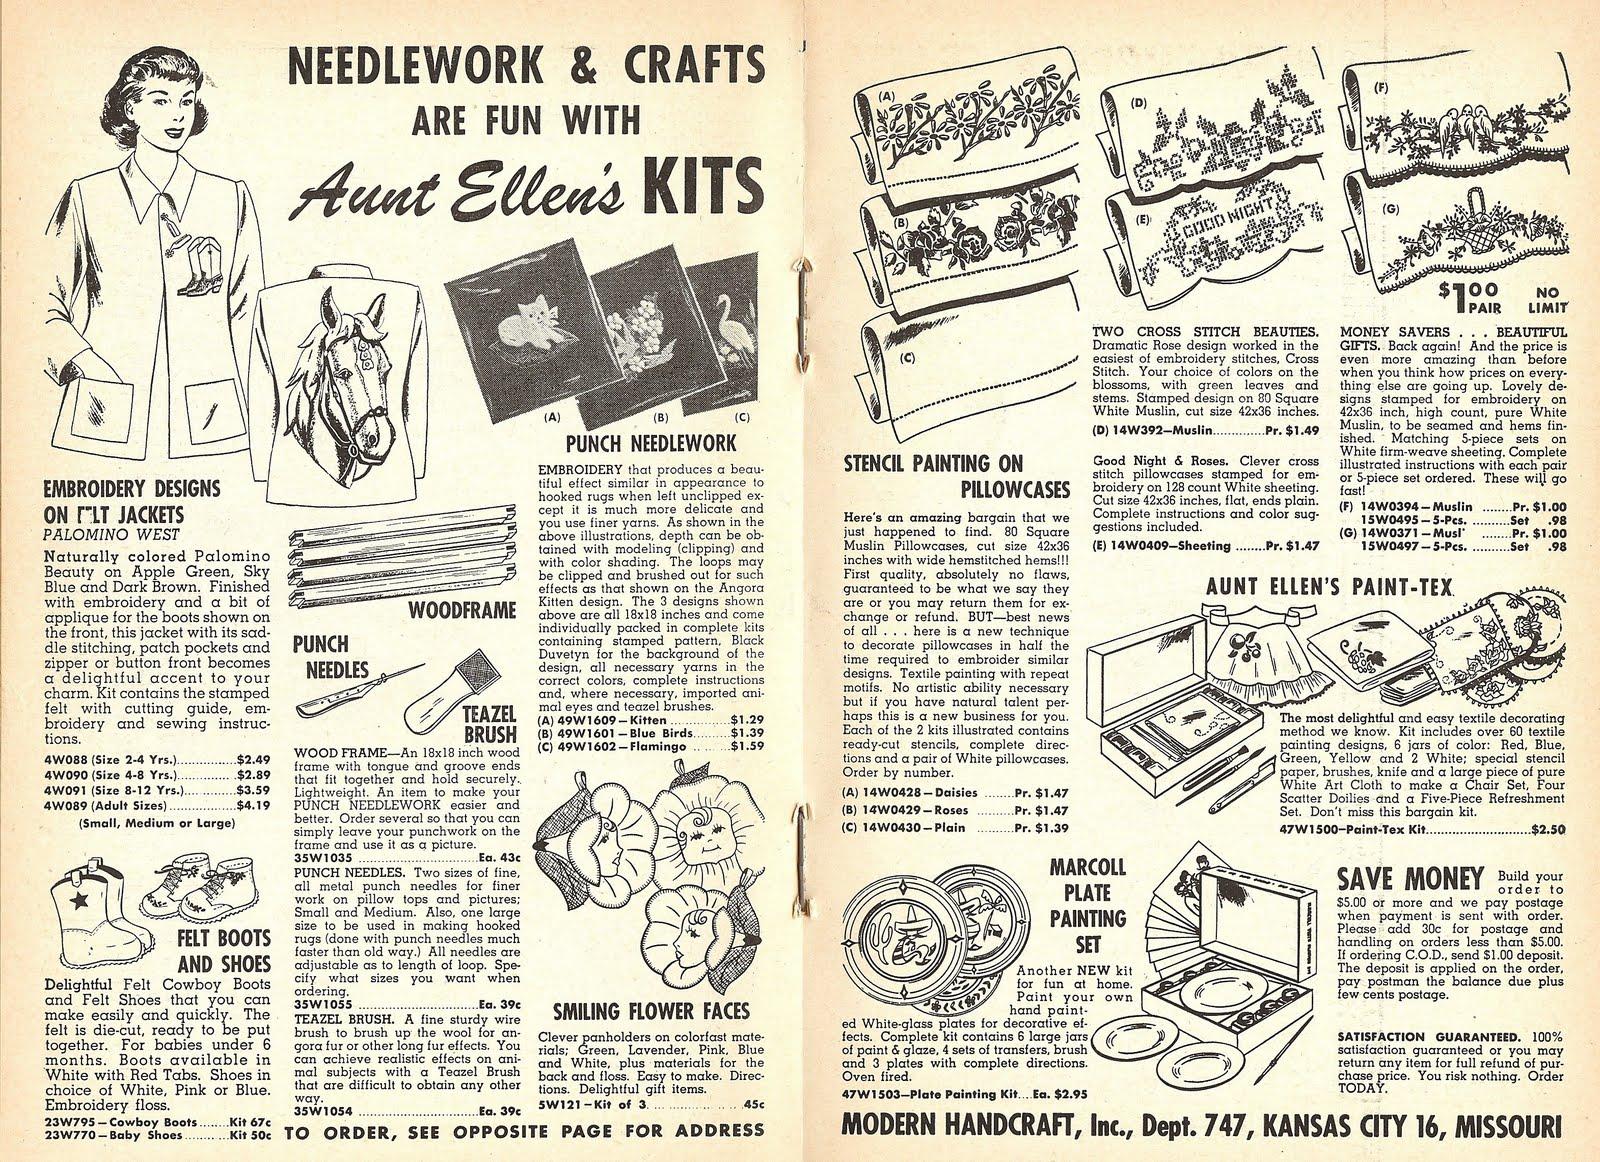 Little Grey Bungalow: Patterns of the Past - Kits From Aunt Ellen